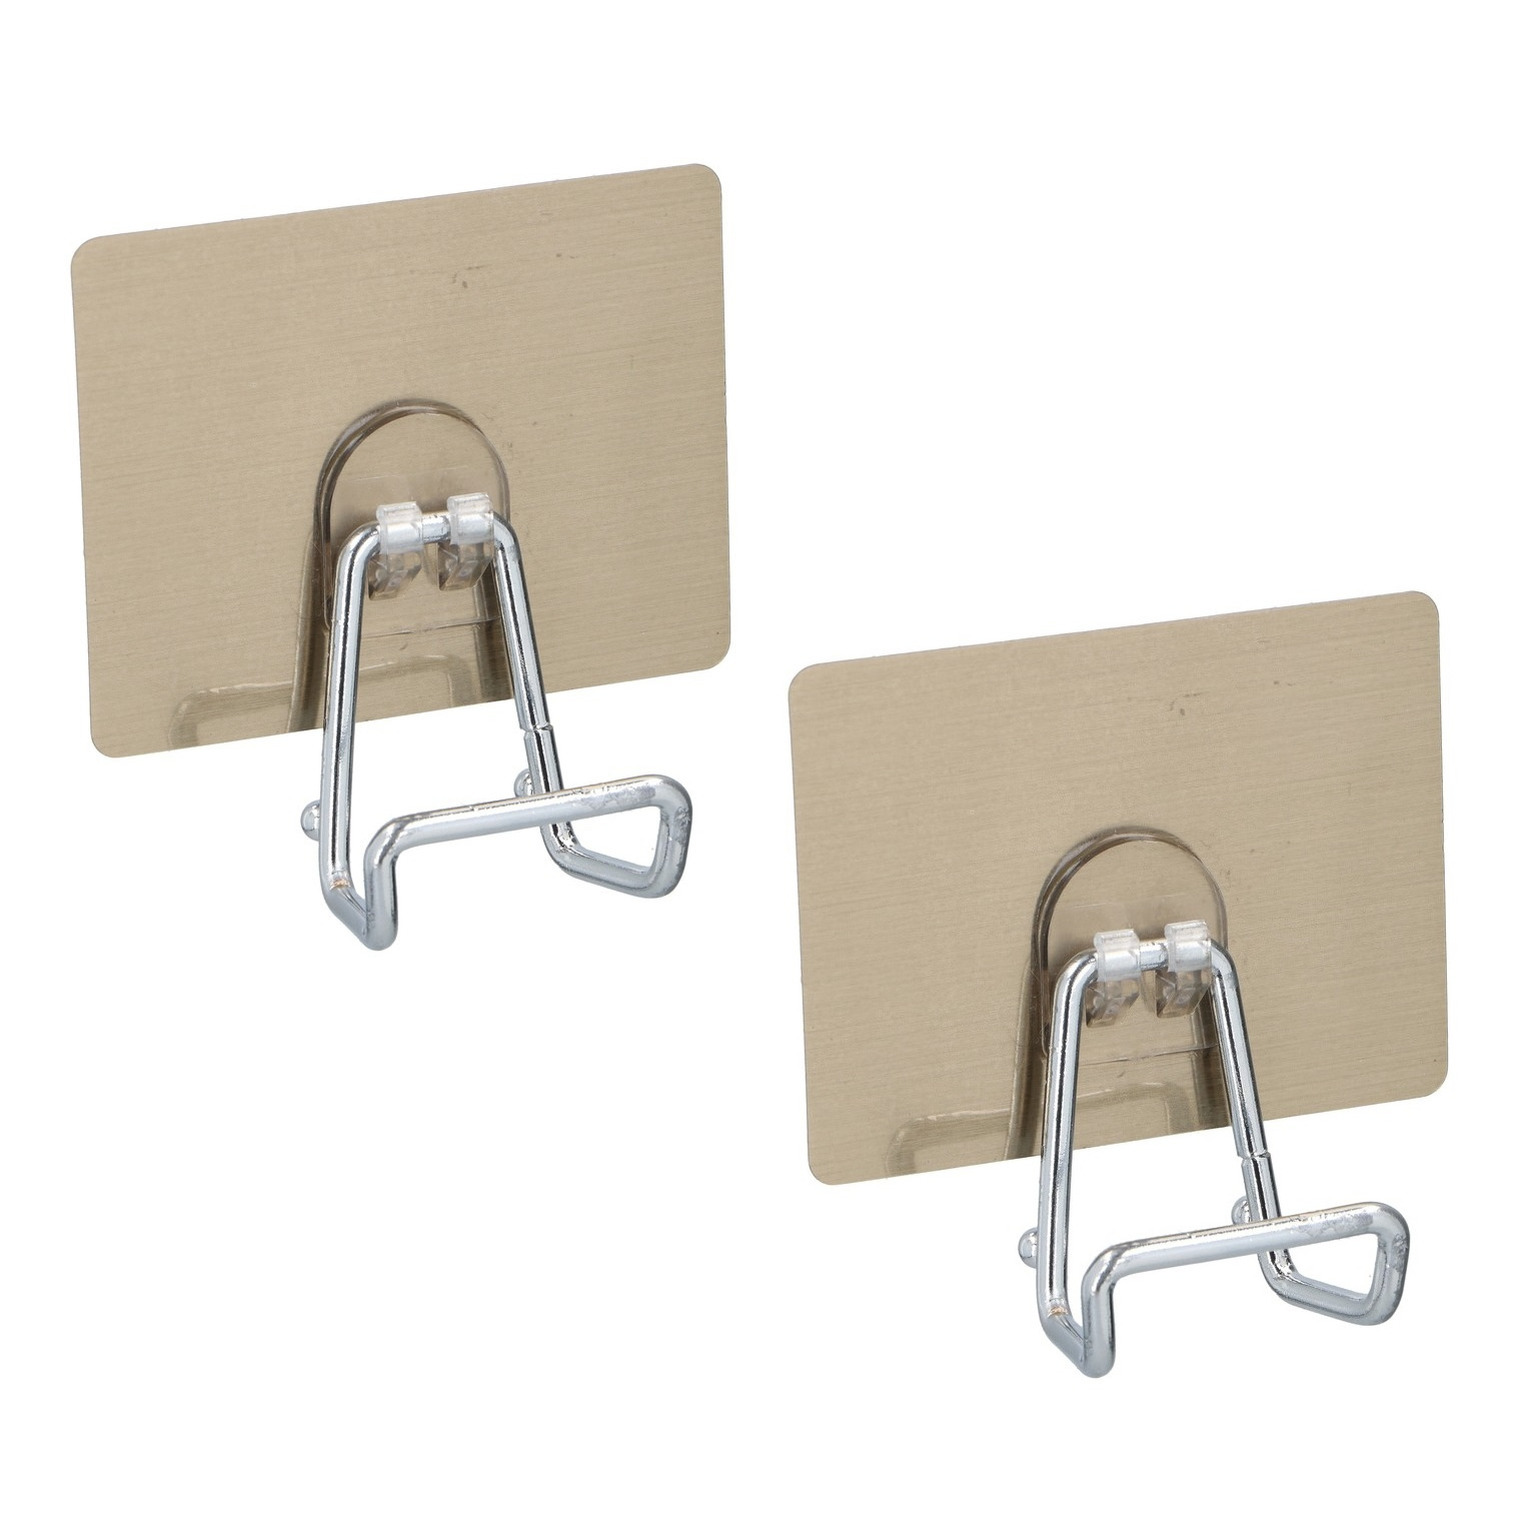 5x stuks zelfklevende badkamer handdoek ophanghaak 9 5 cm